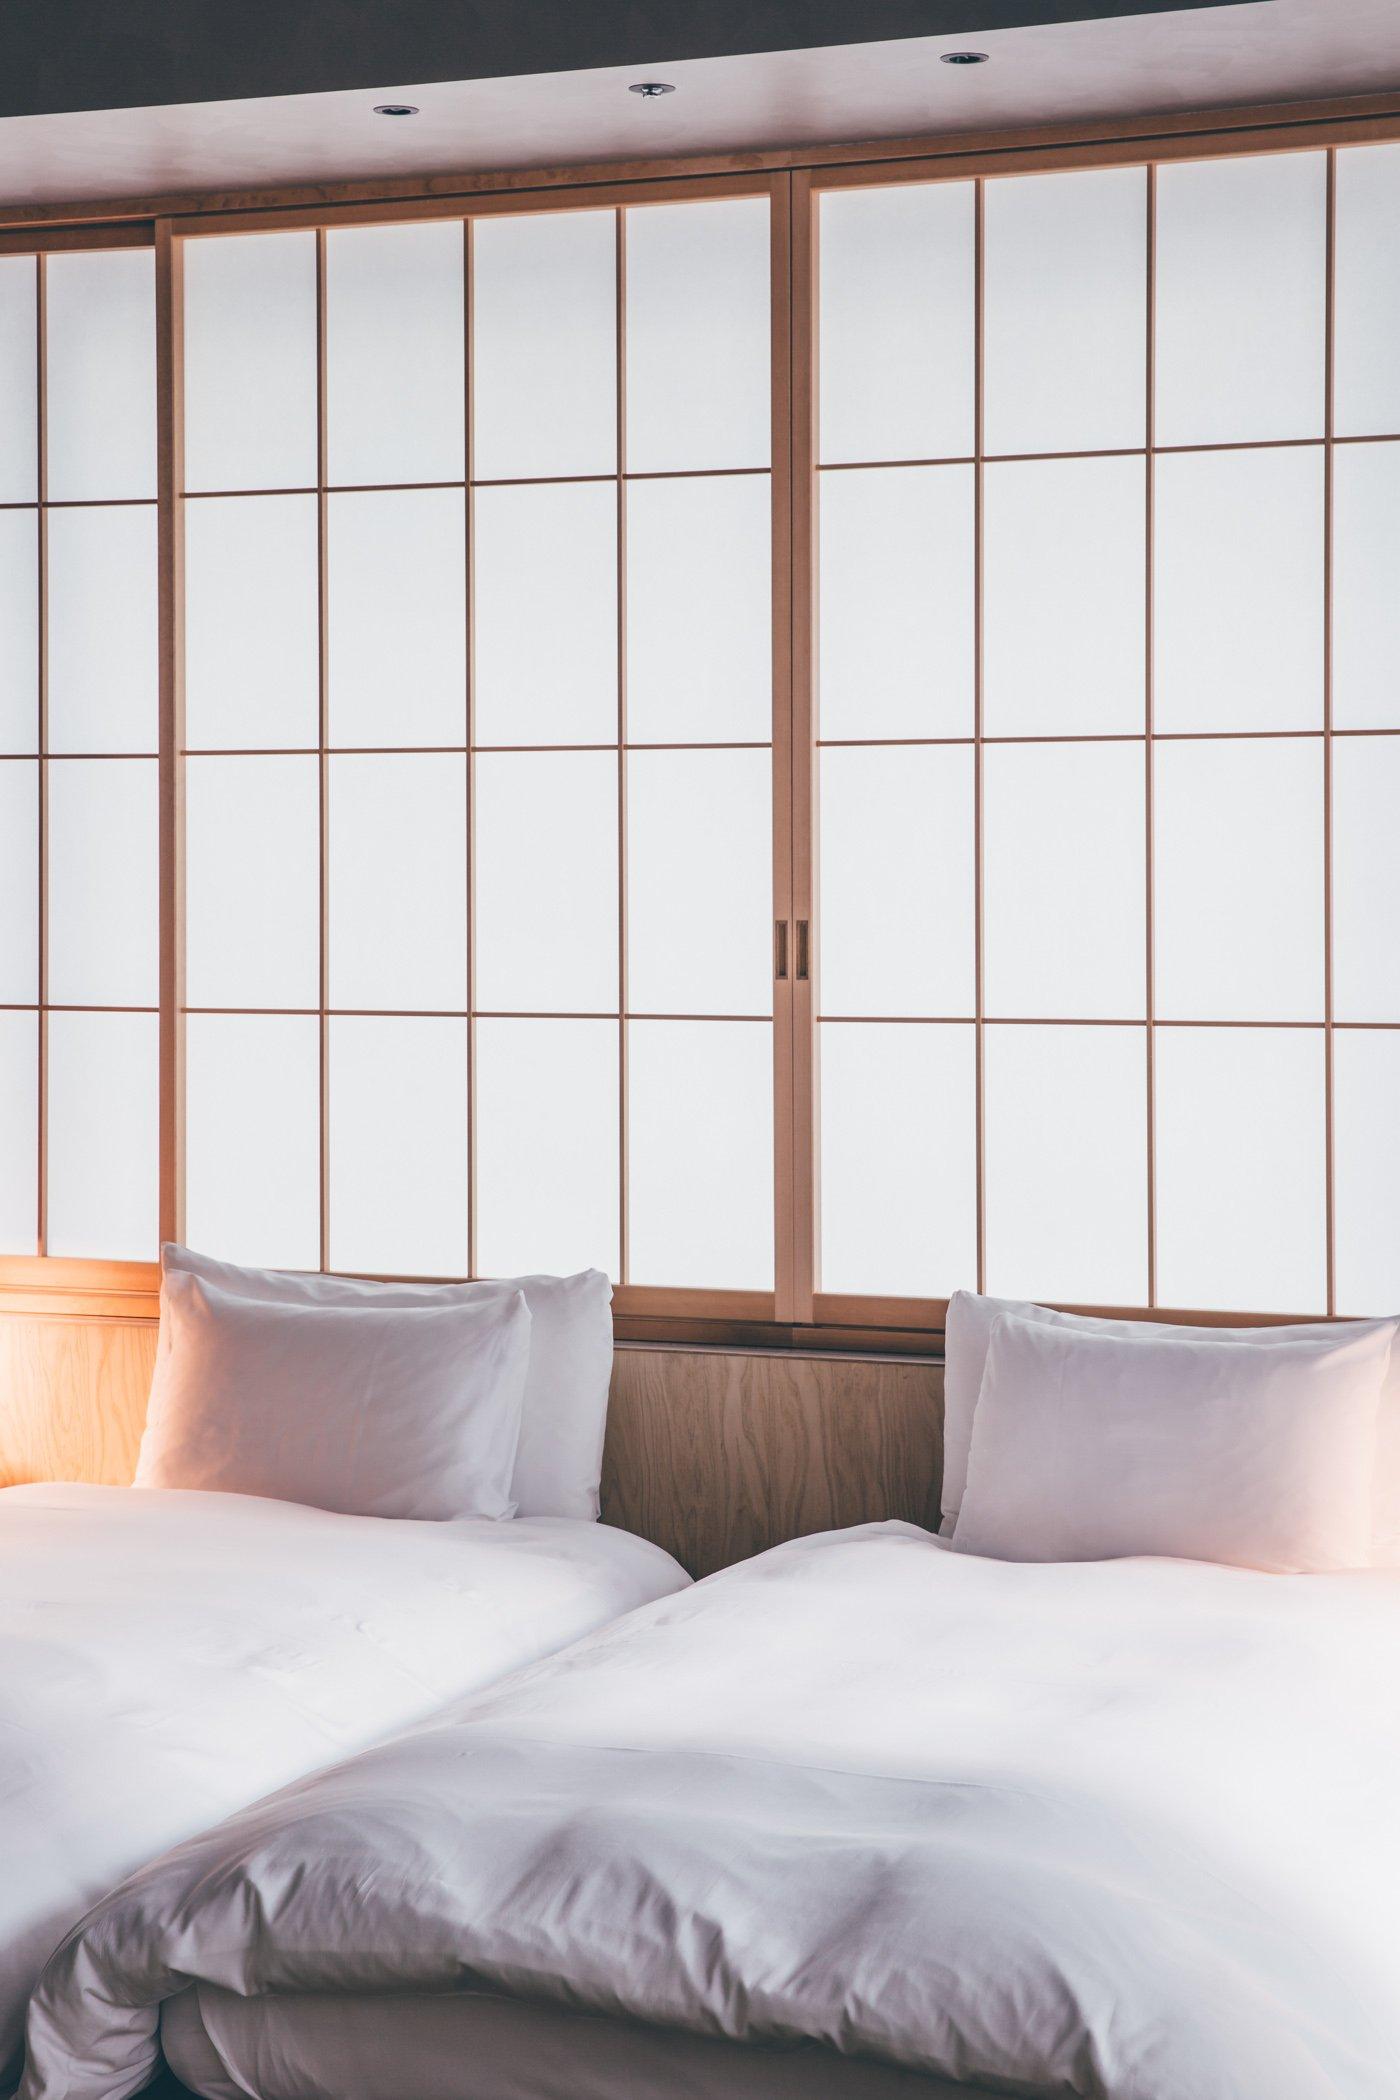 Hoshinoya Hotel Tokyo